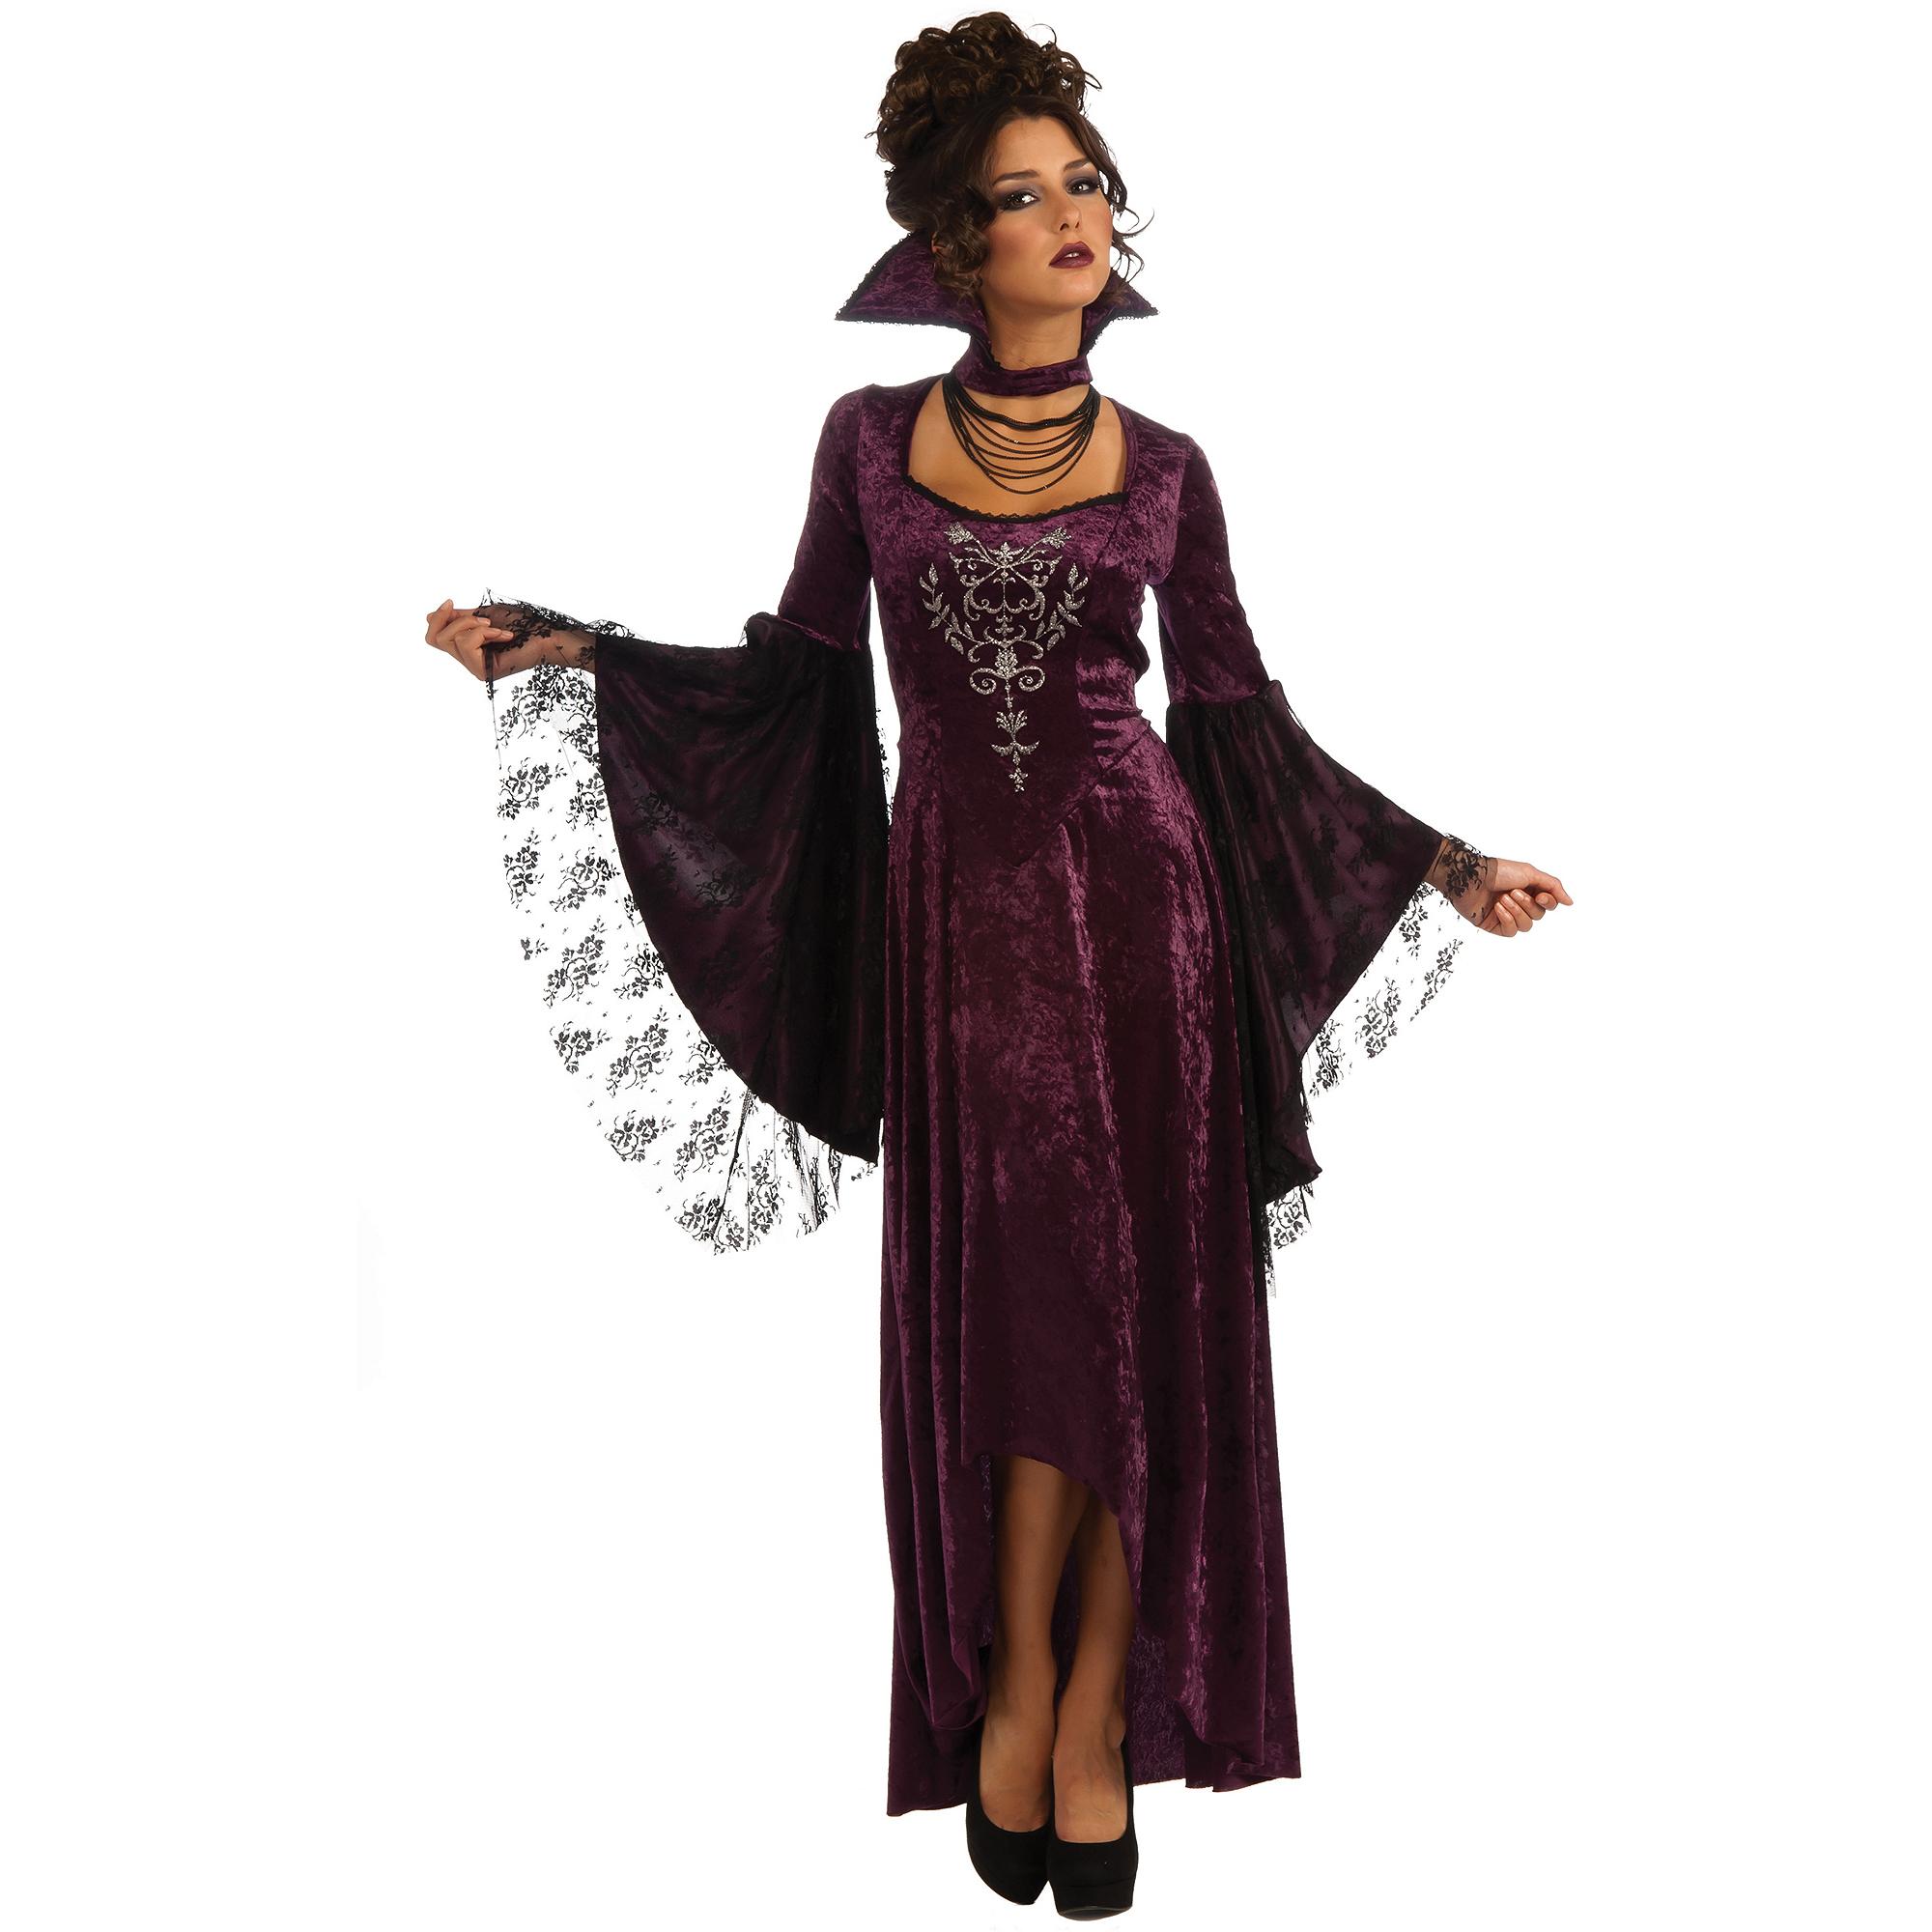 sc 1 st  Walmart & Violet Vamp Womens Halloween Costume - Walmart.com